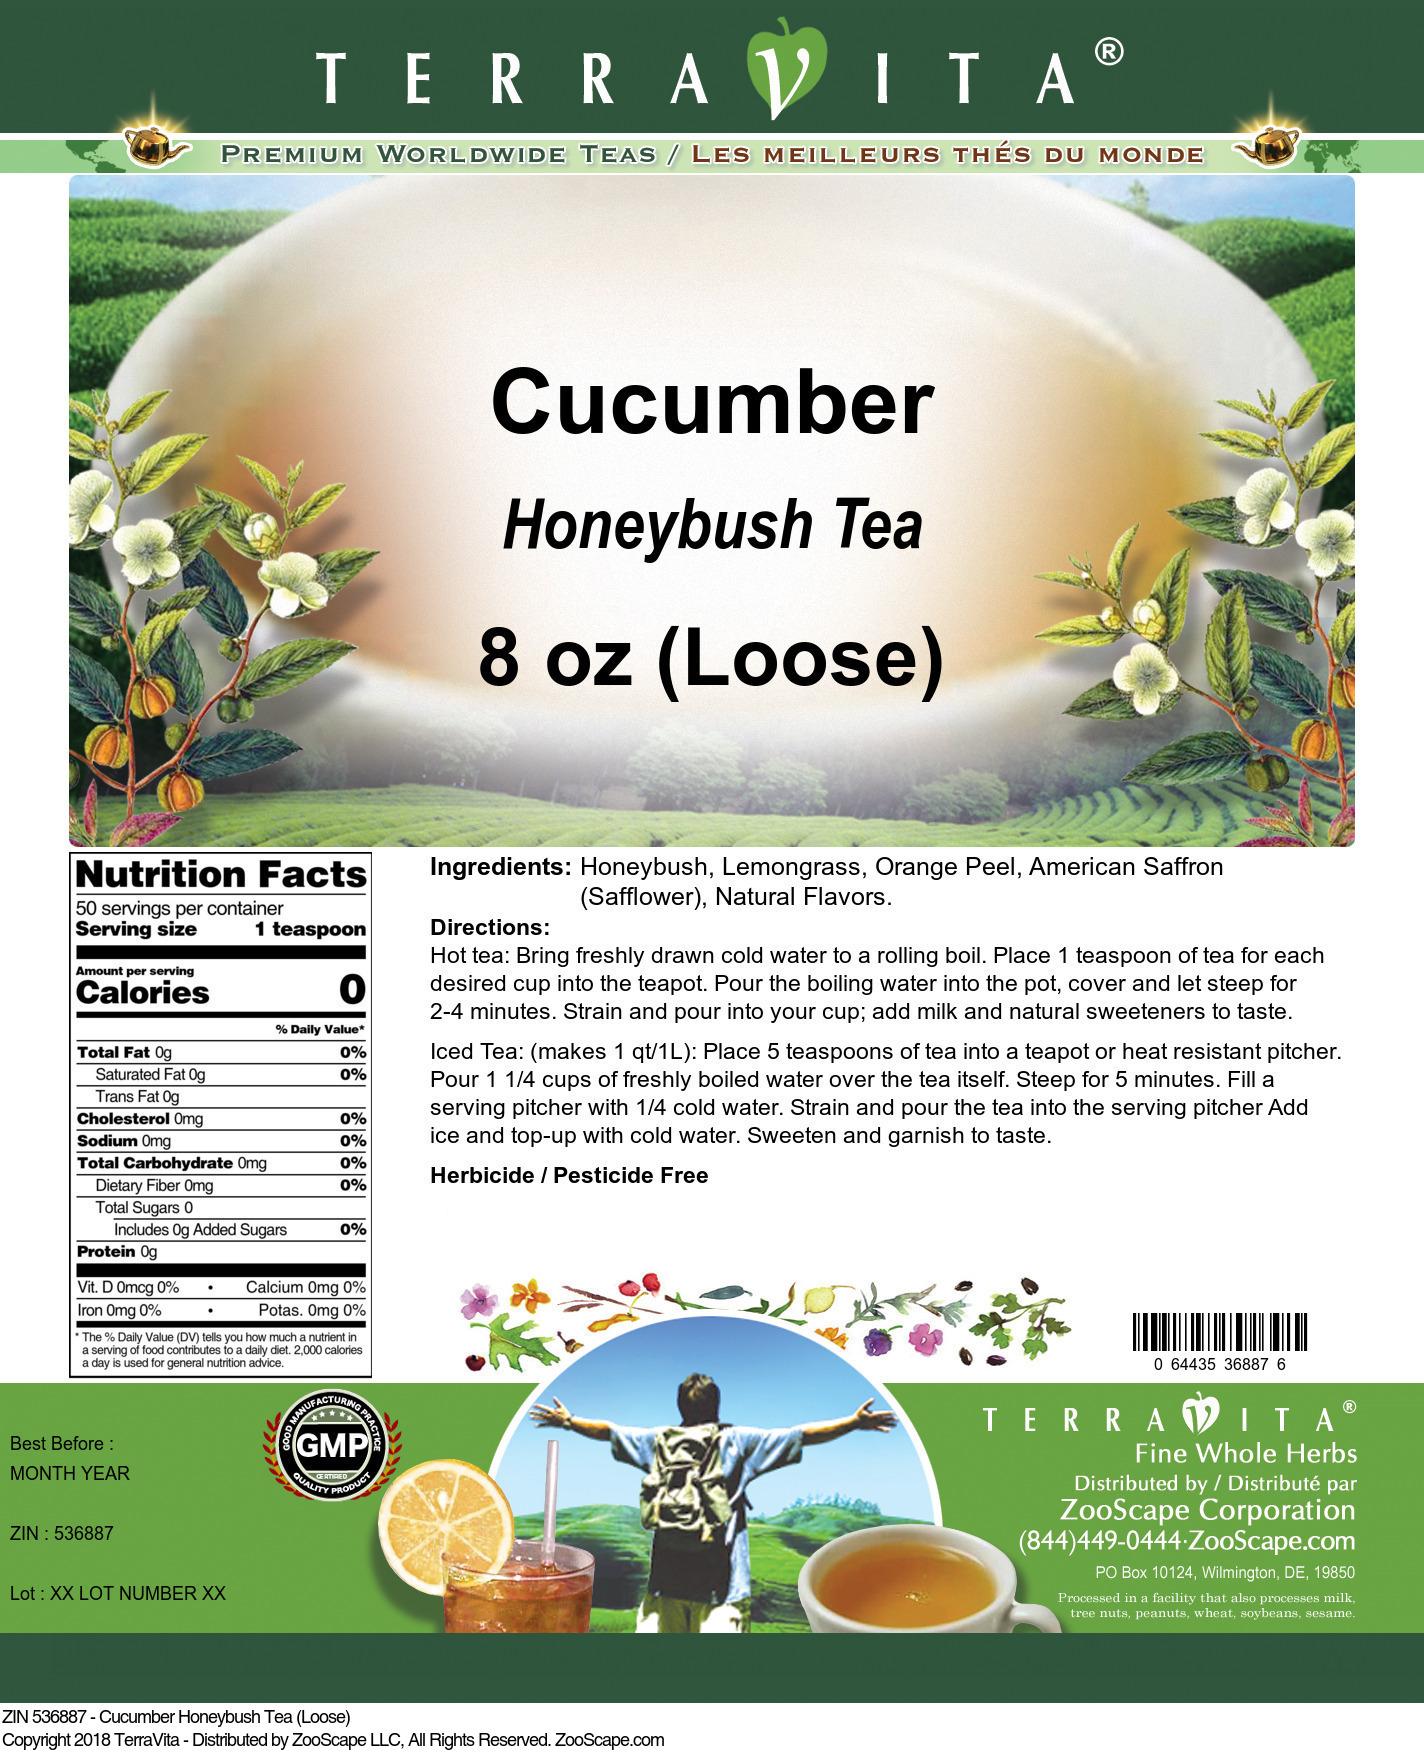 Cucumber Honeybush Tea